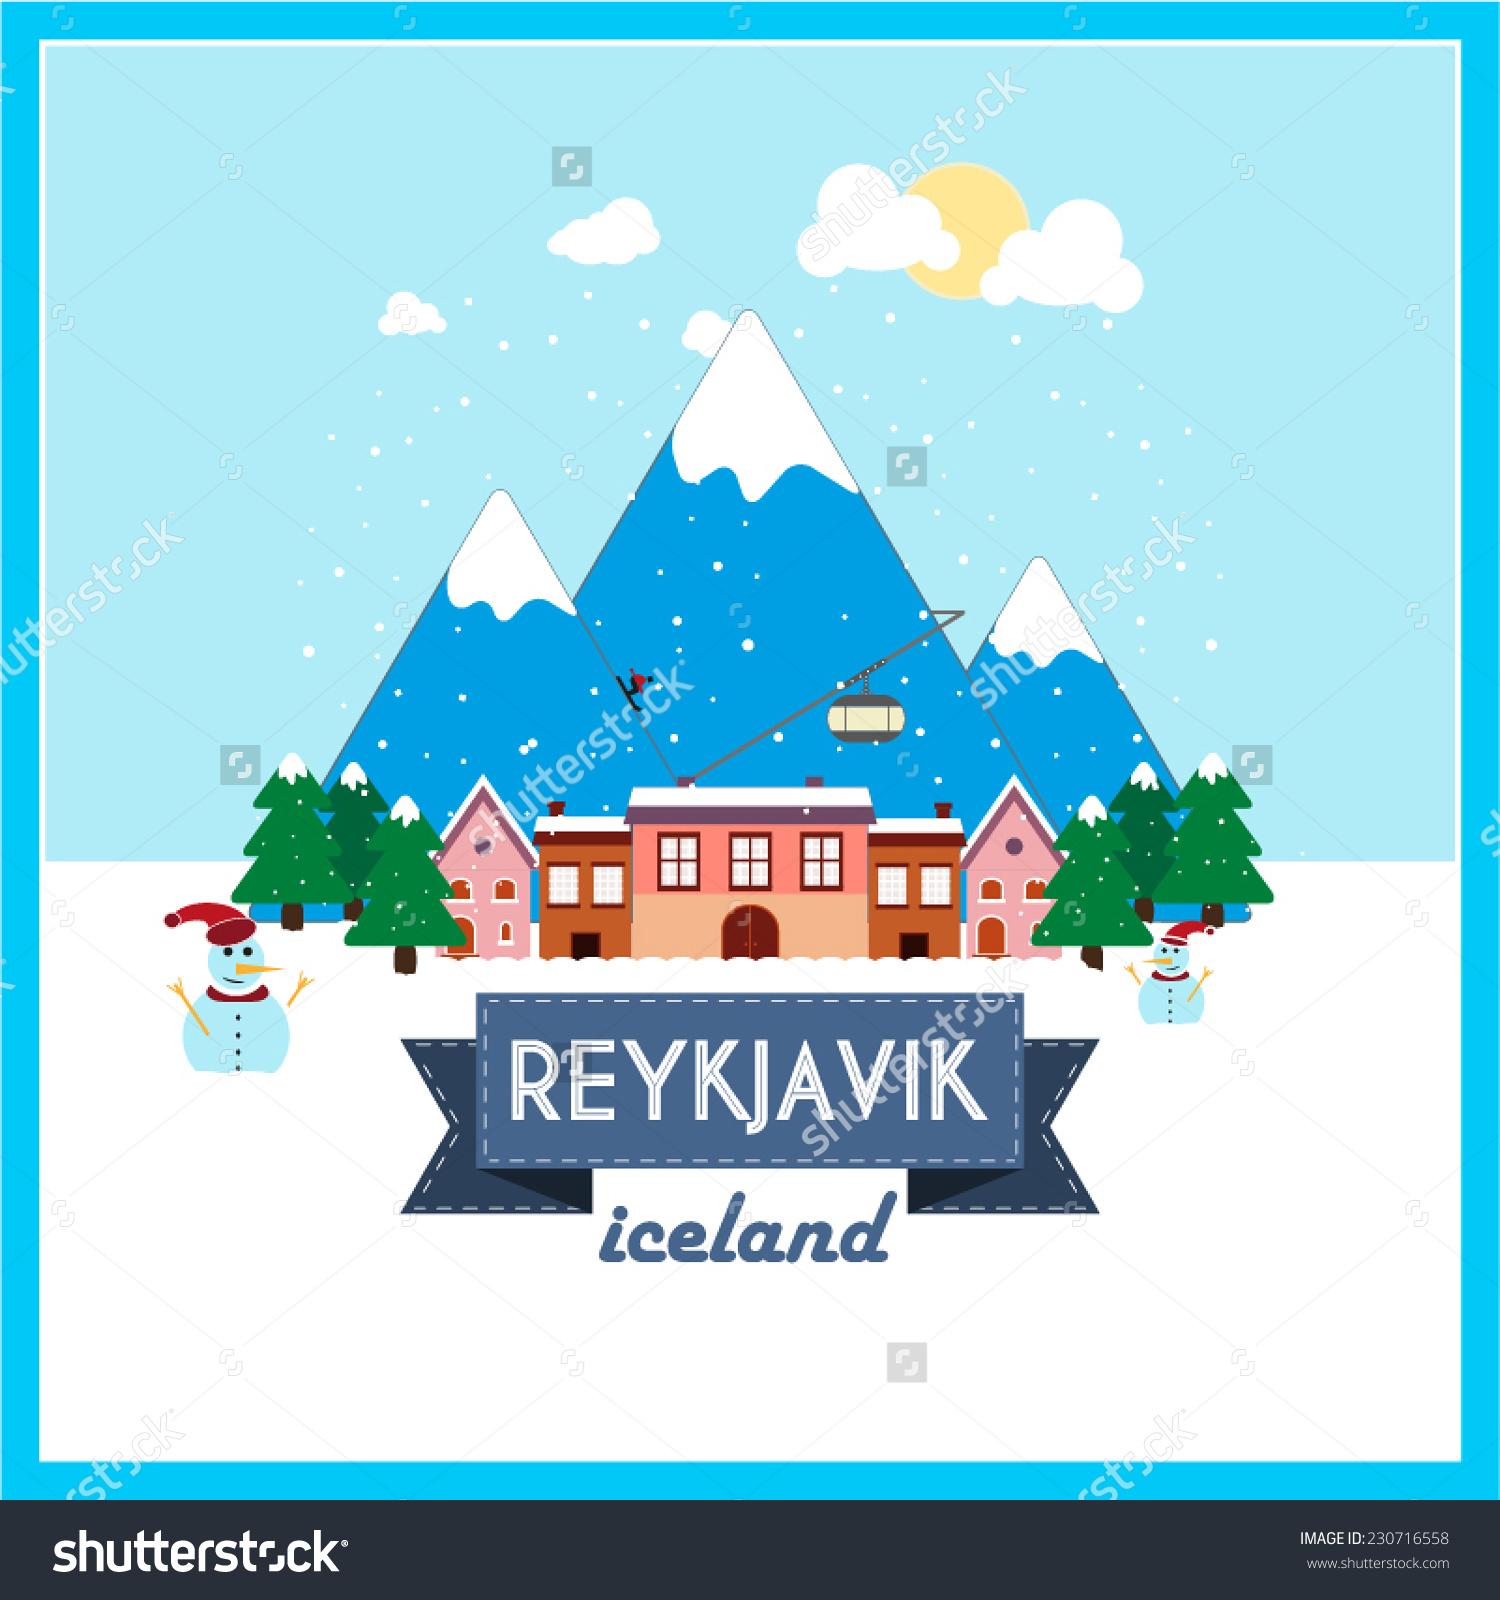 Reykjavik Iceland Winter Holiday Destination Flat Stock Vector.